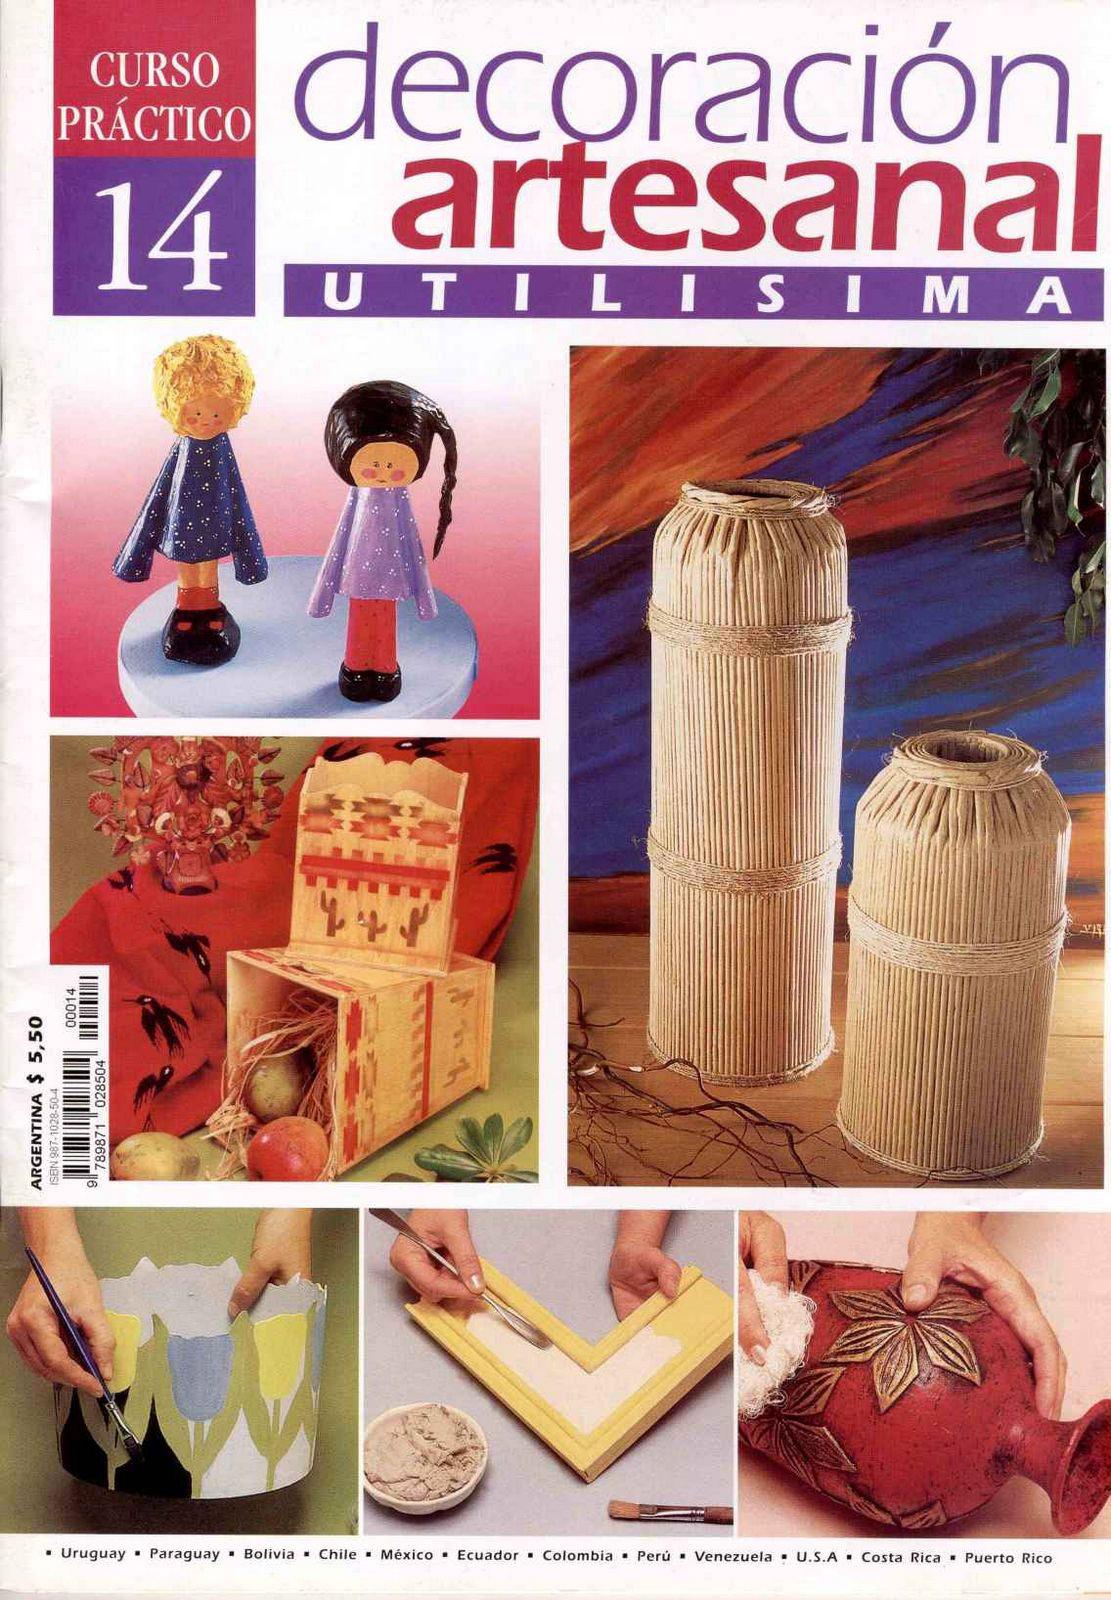 Util sima nro 14 decoraci n artesanal freelibros for Decoracion hogar artesanal